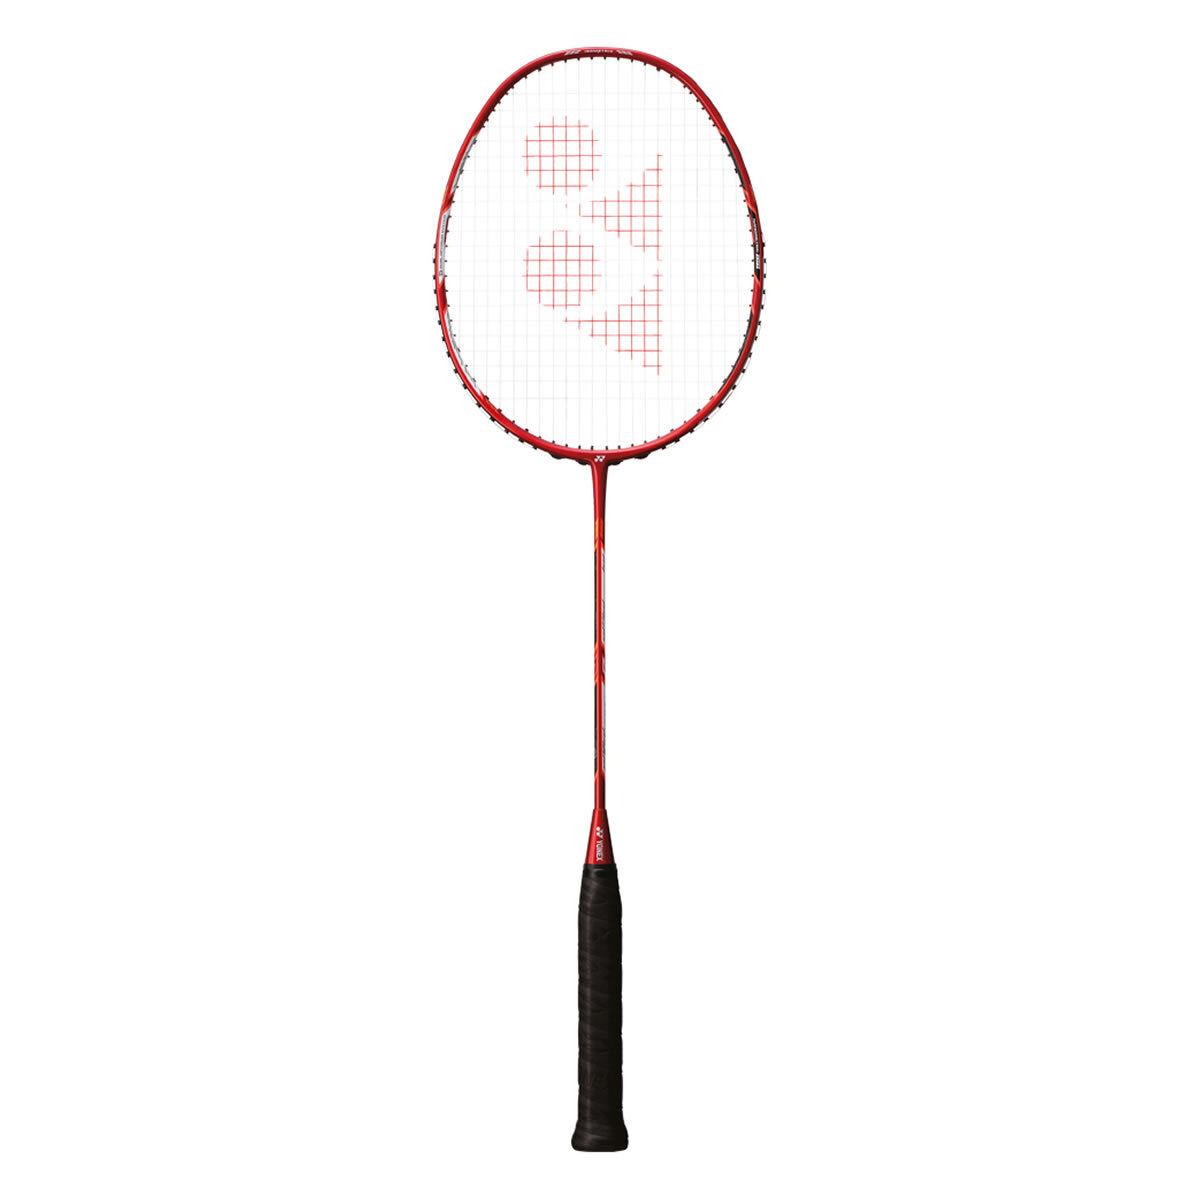 YONEX Duora 7 Badmintonschläger bespannt  mit YONEX BG 65 10Kg -NEU-